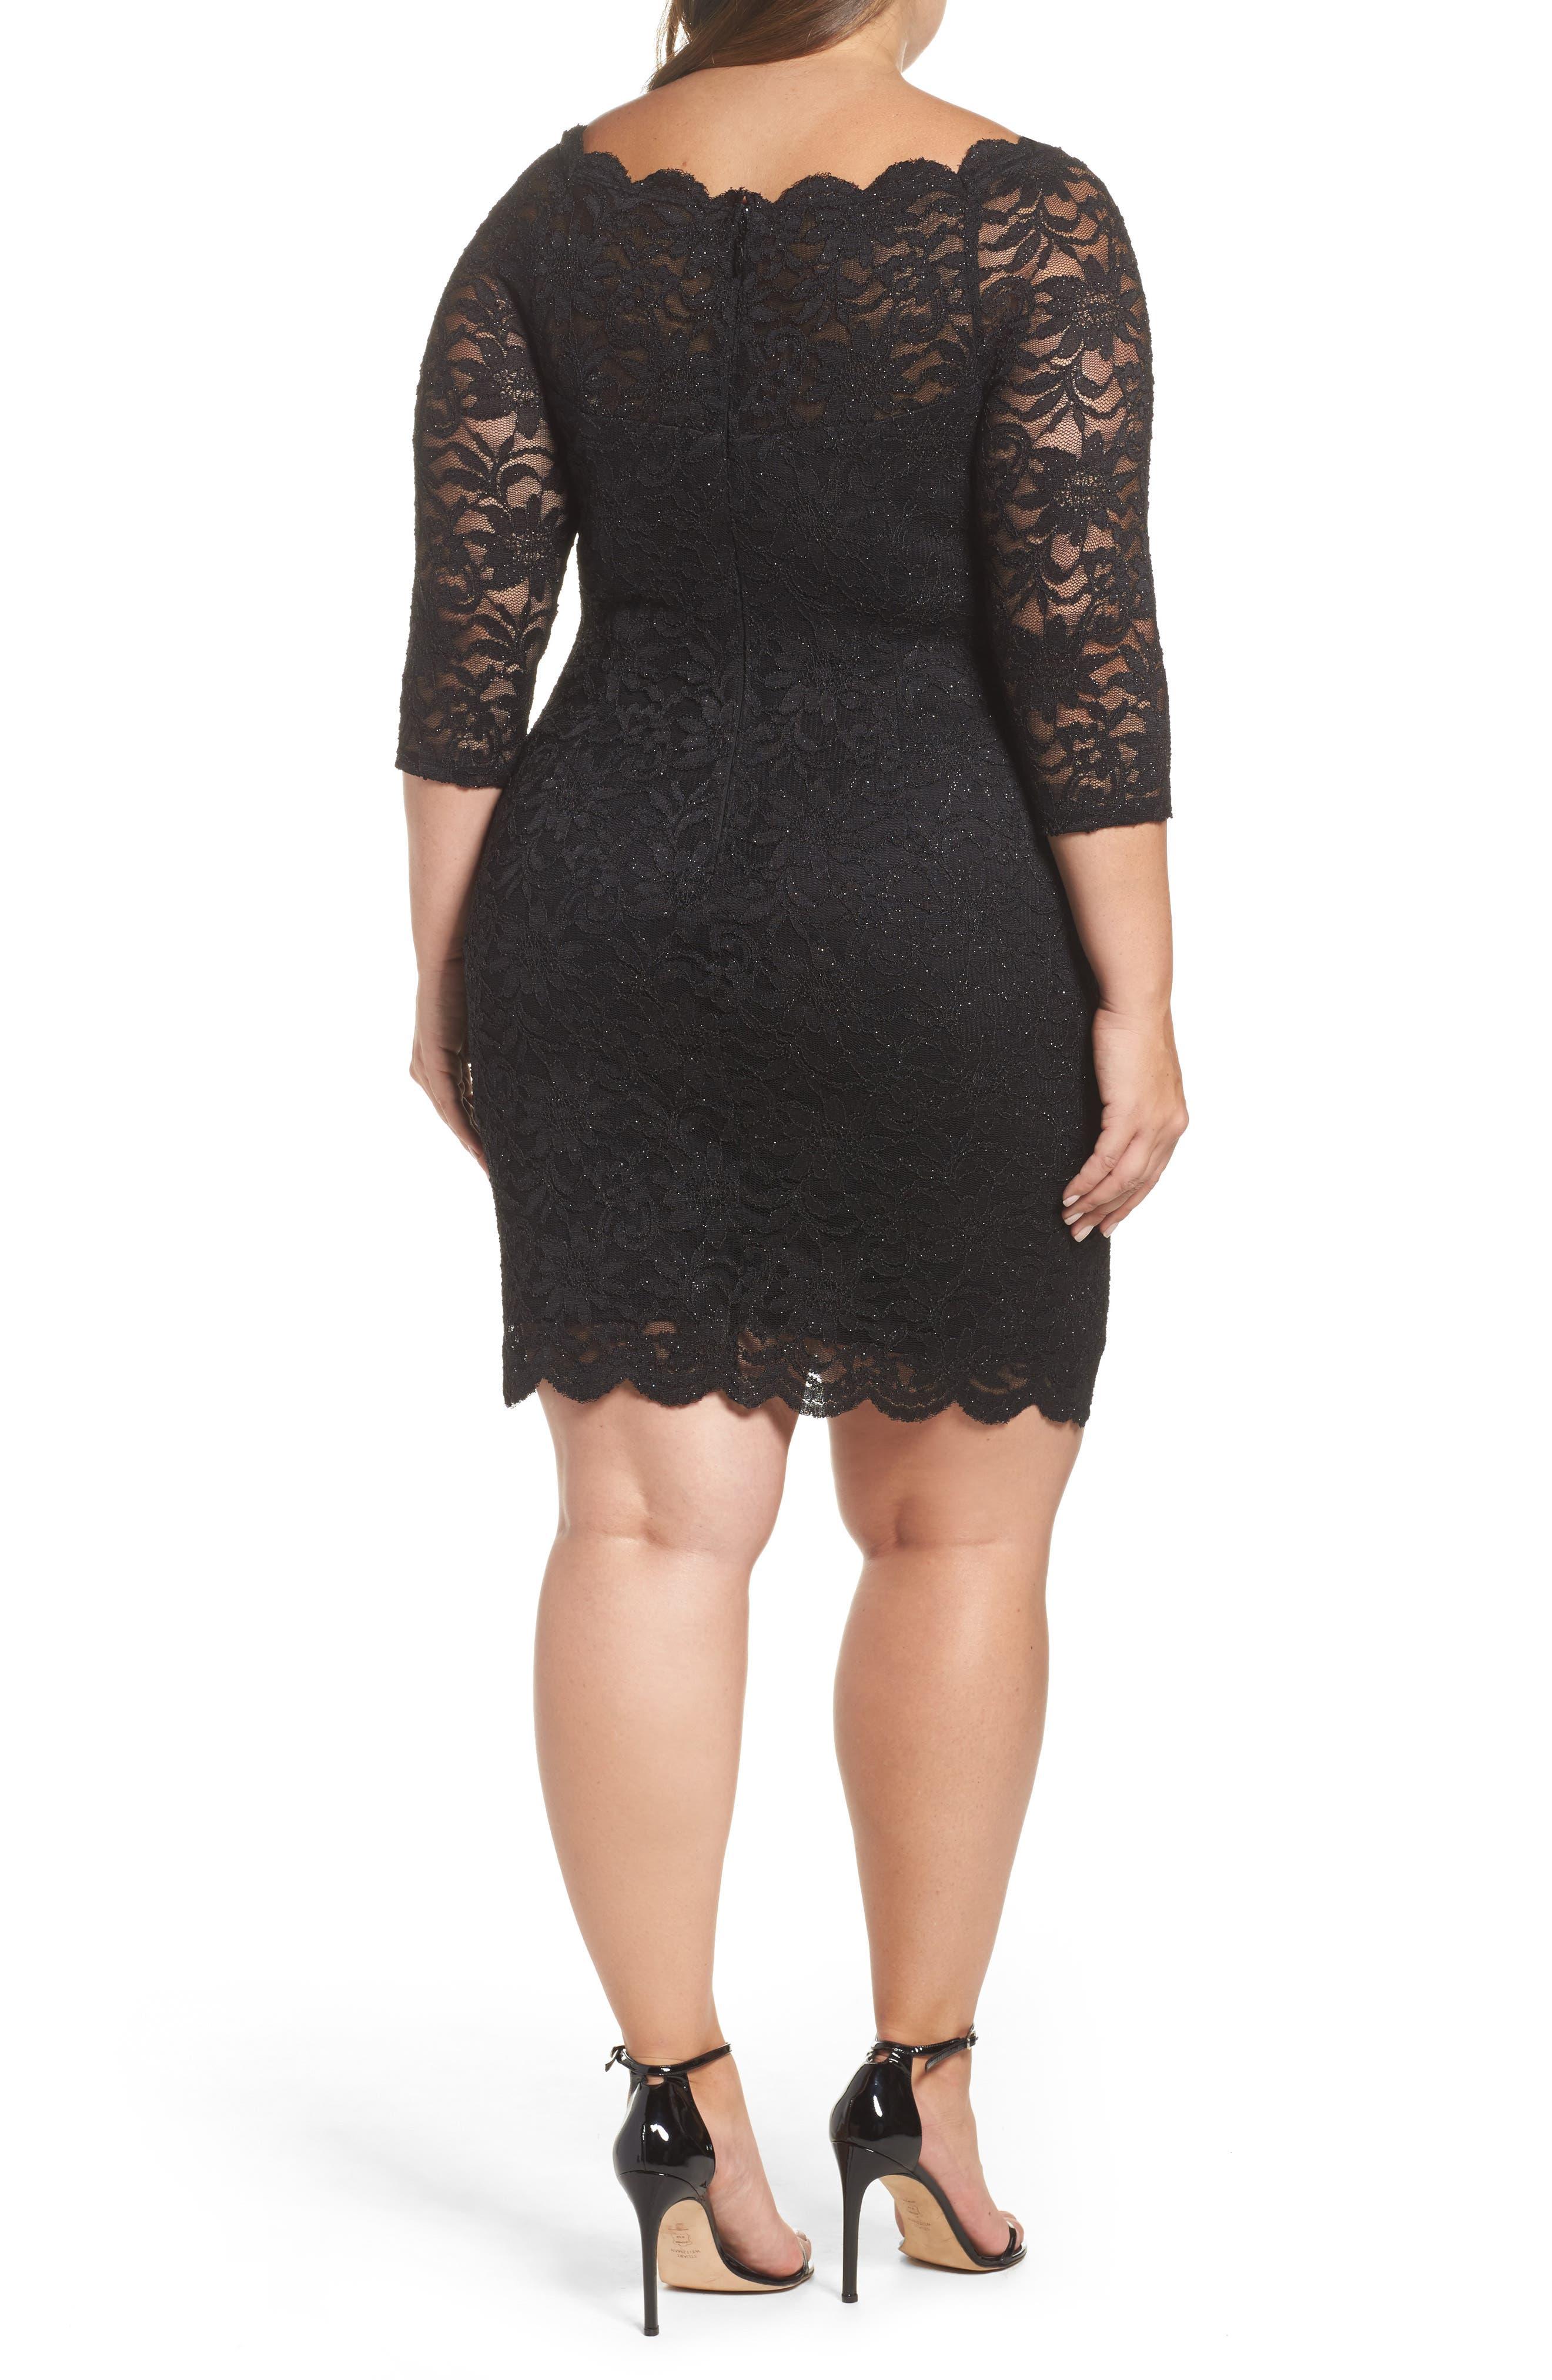 Glitter Lace Cocktail Dress,                             Alternate thumbnail 2, color,                             BLACK